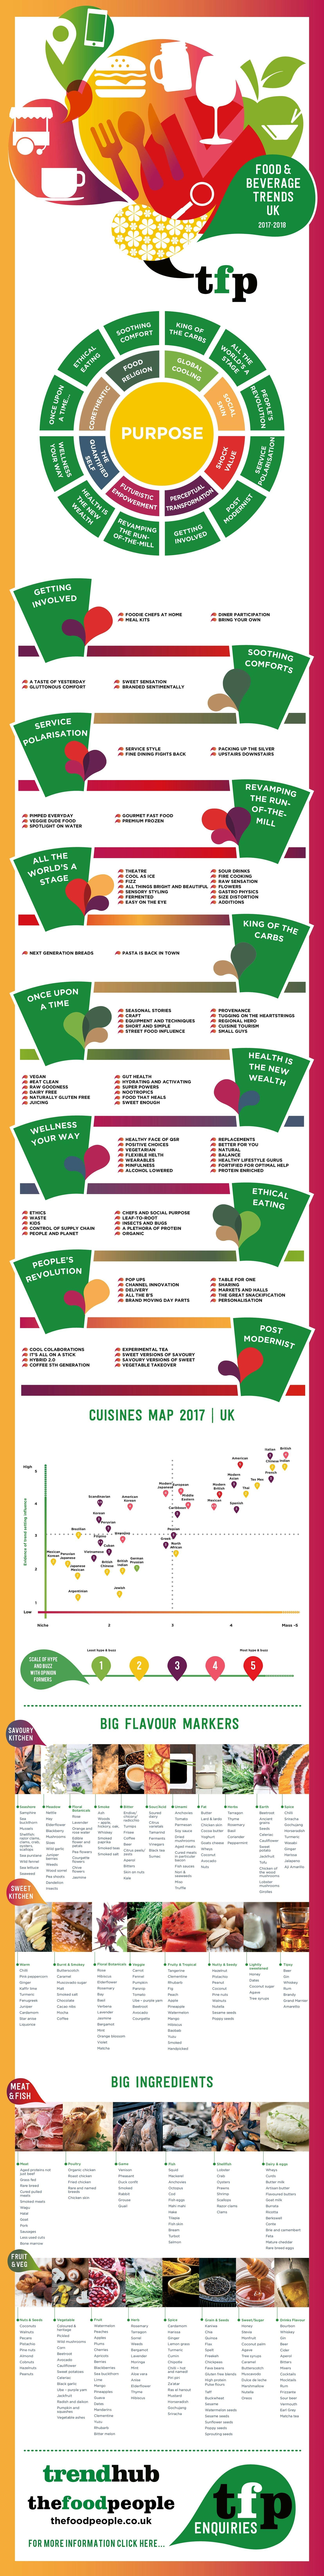 UK Food & Drink Trends for 2017